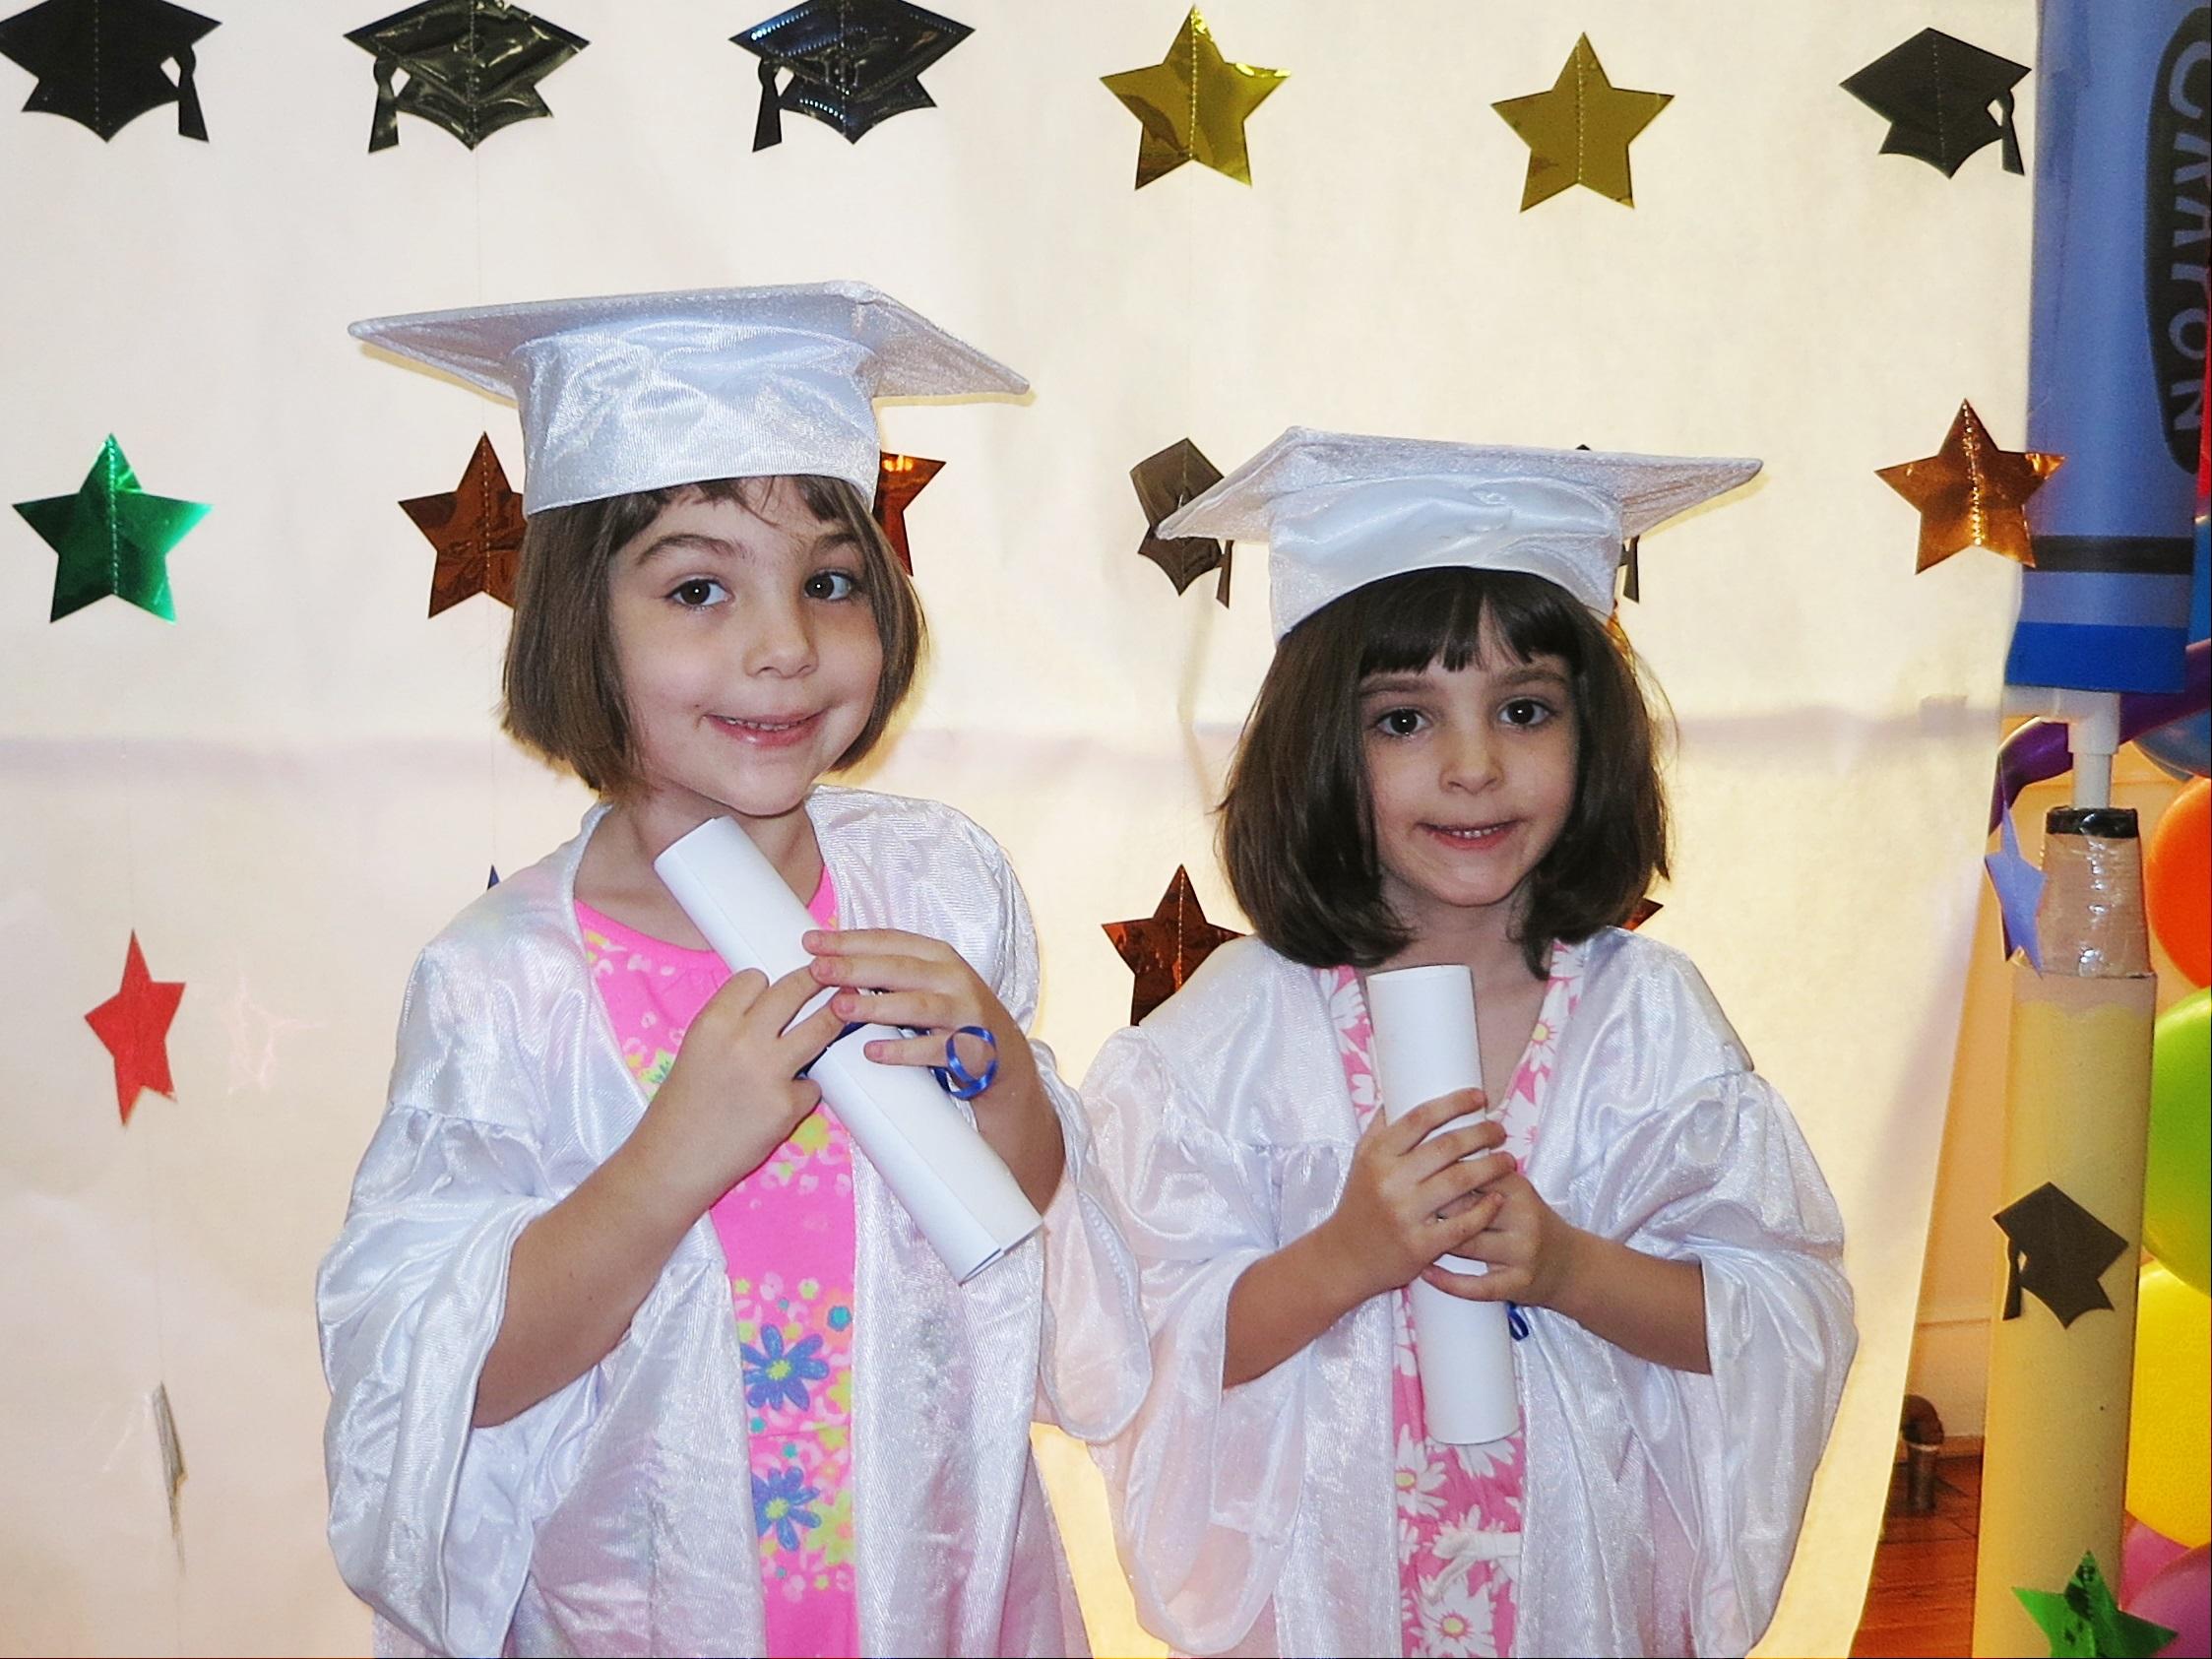 Twins graduation gowns